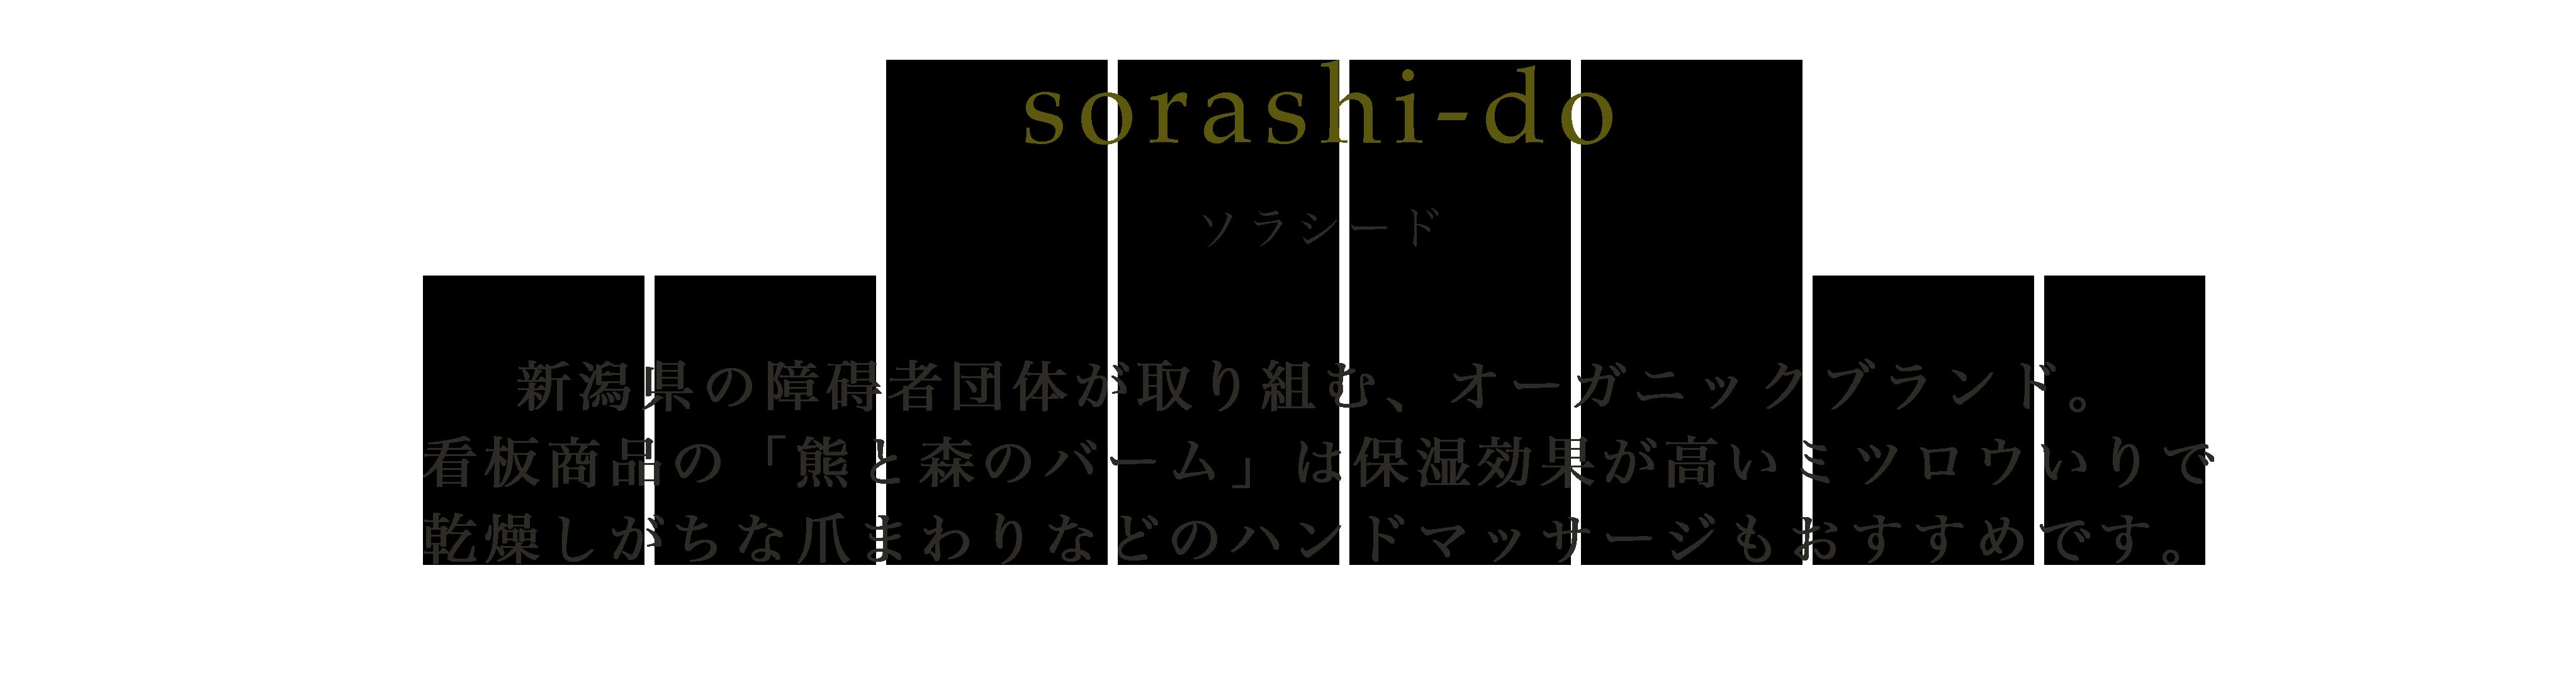 sorashi-do